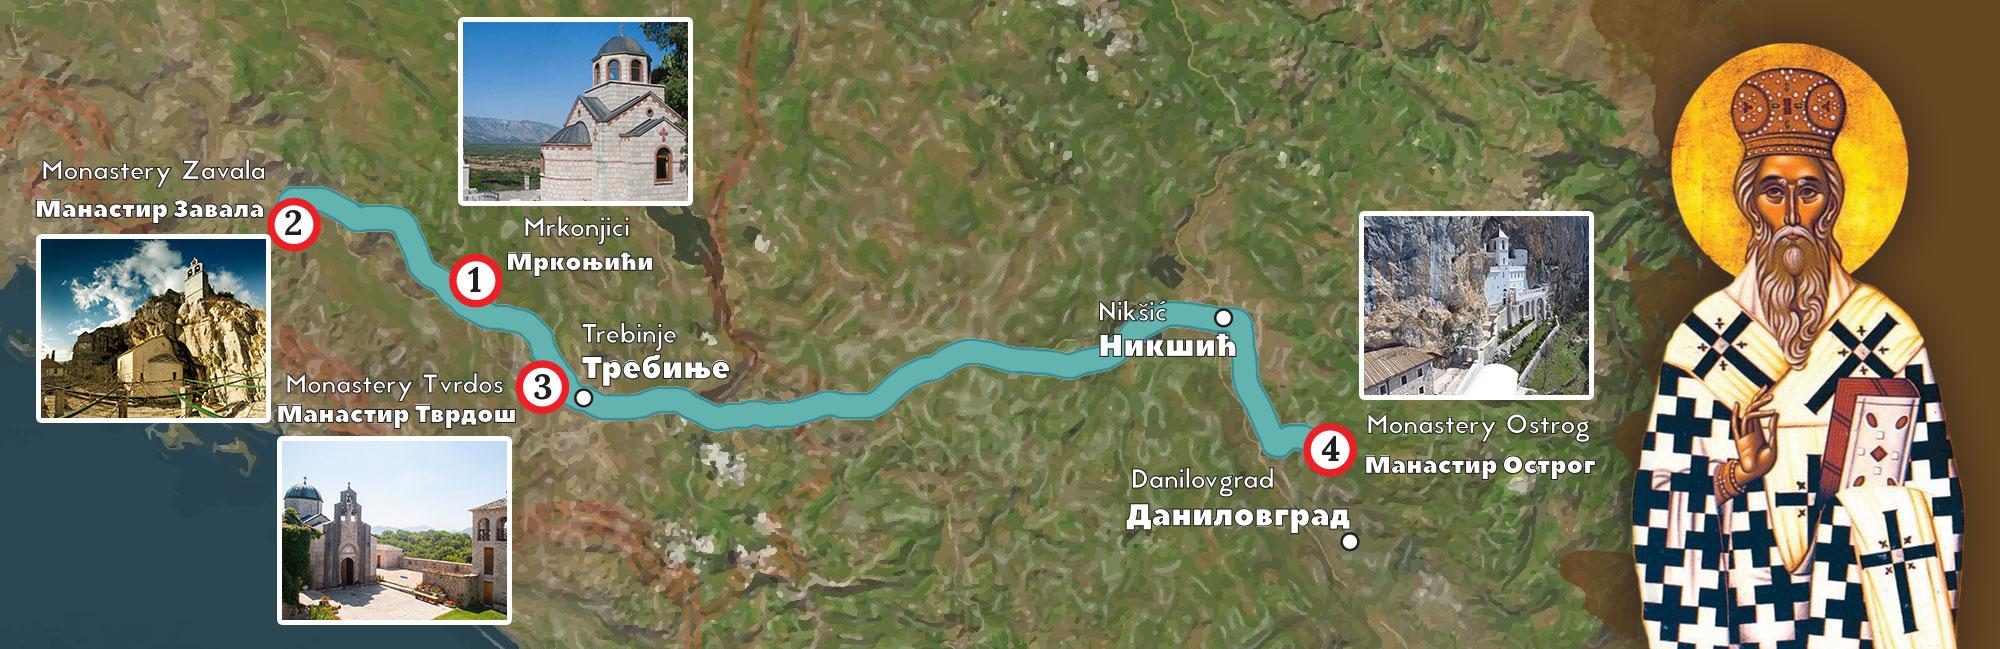 Udaljenost Kragujevac Manastir Ostrog Km